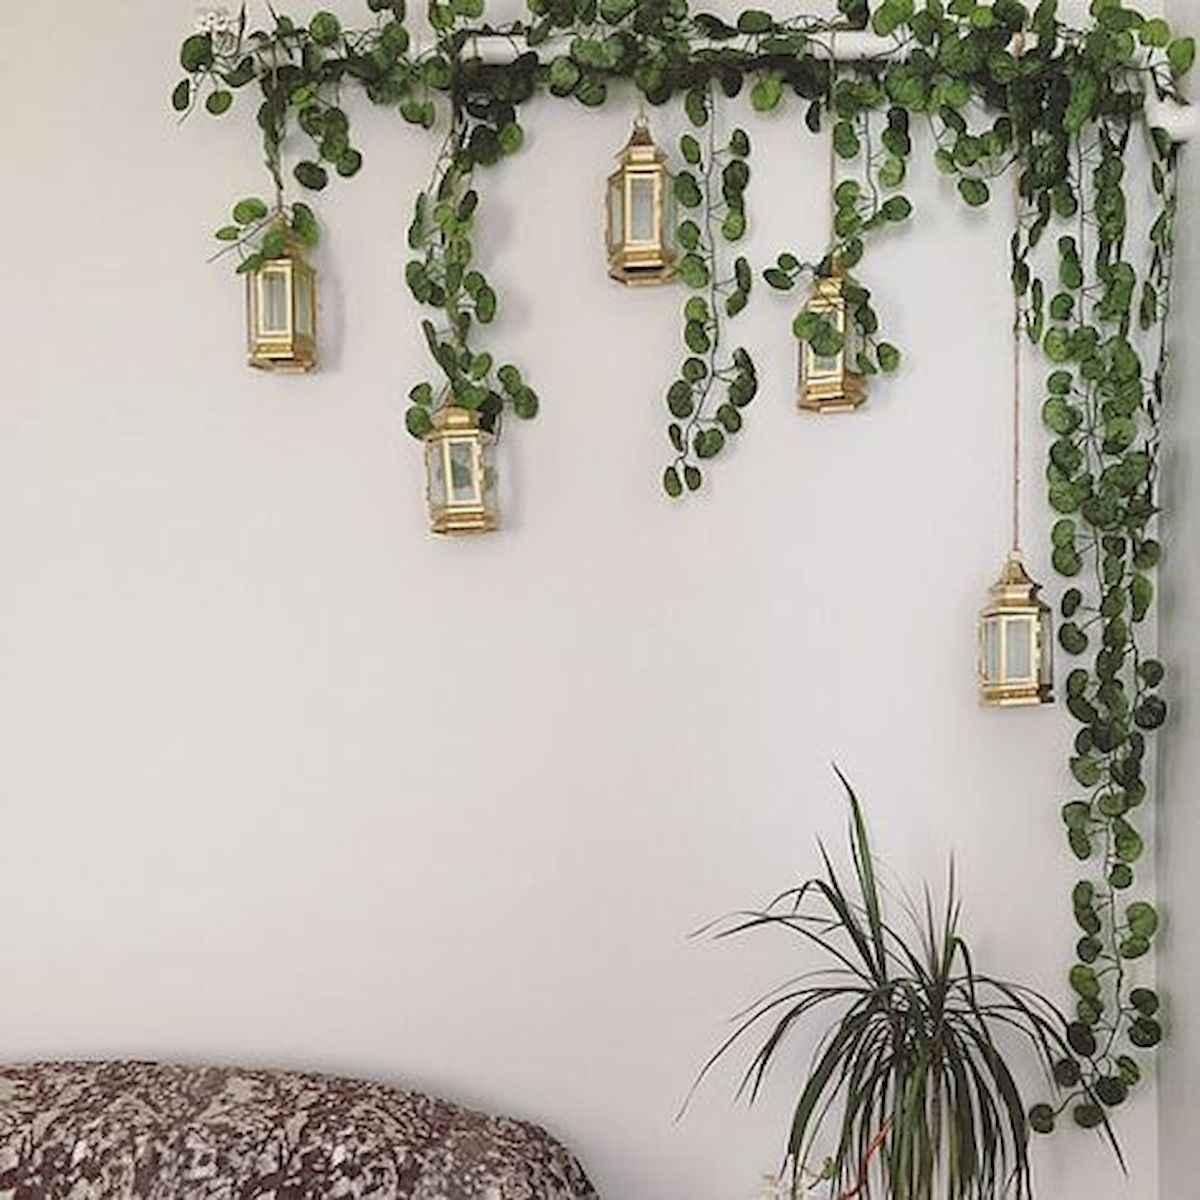 50 Amazing Vertical Garden Design Ideas And Remodel (24)